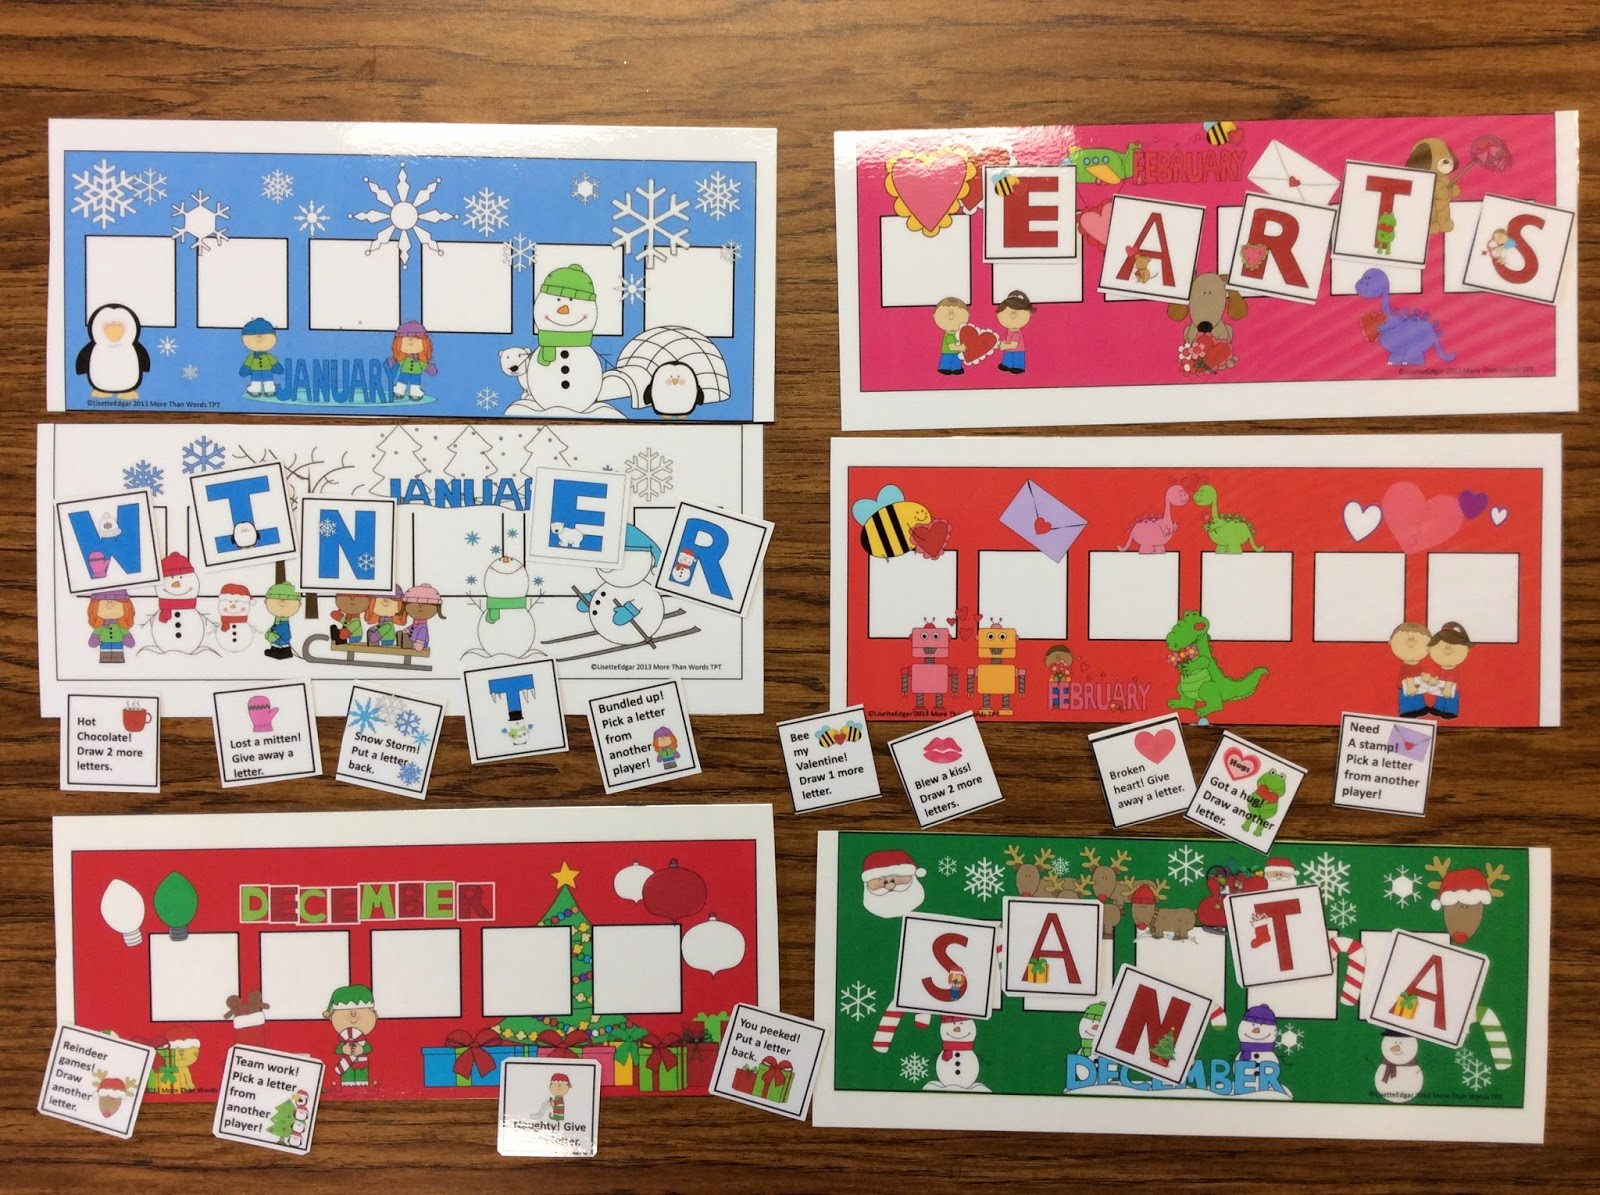 https://www.teacherspayteachers.com/Product/Winter-Speech-Vocabulary-Games-Christmas-Winter-Valentines-Day-995649